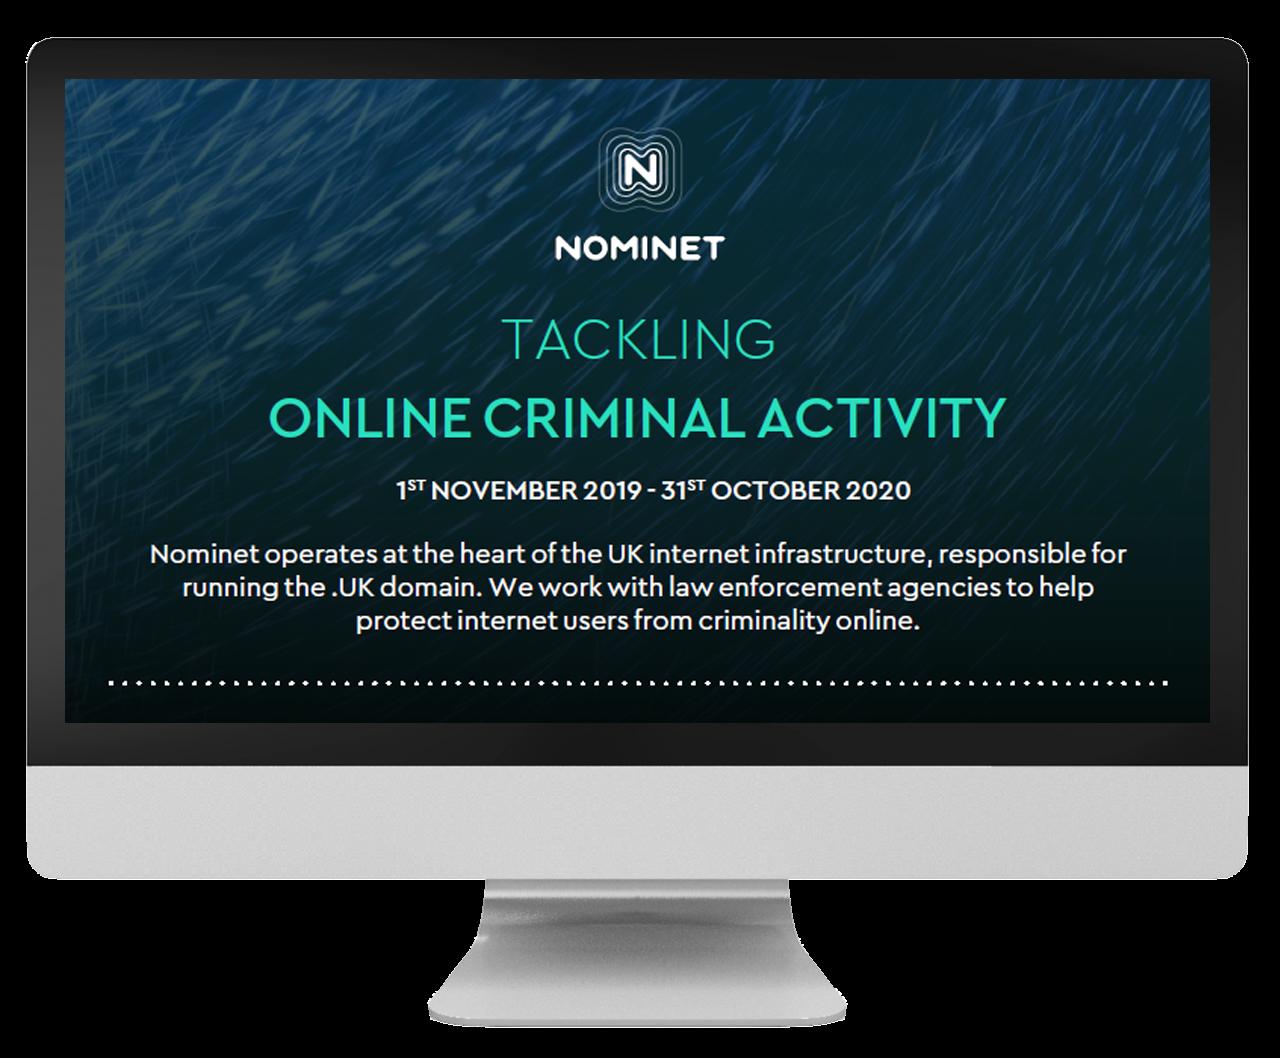 Desktop screen promoting Tackling Online Criminal Activity